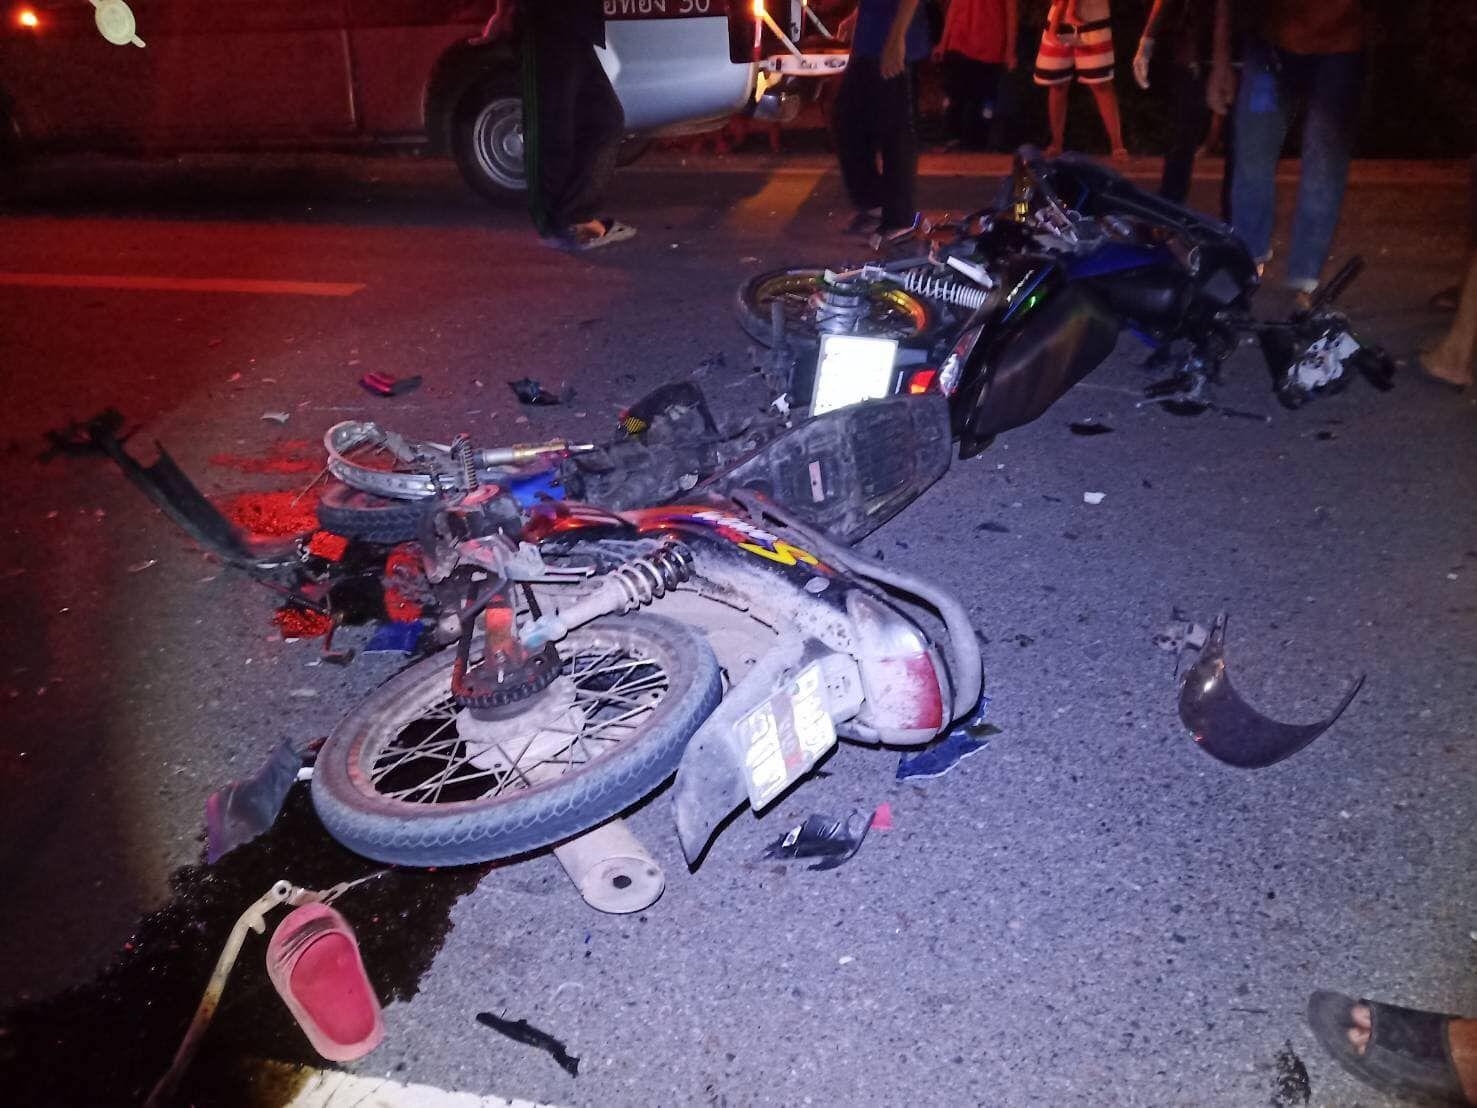 One Killed One In Coma After Chonburi Motorbike Accident Thepattayanews Pattayanews Pattaya Crash Motorbikes